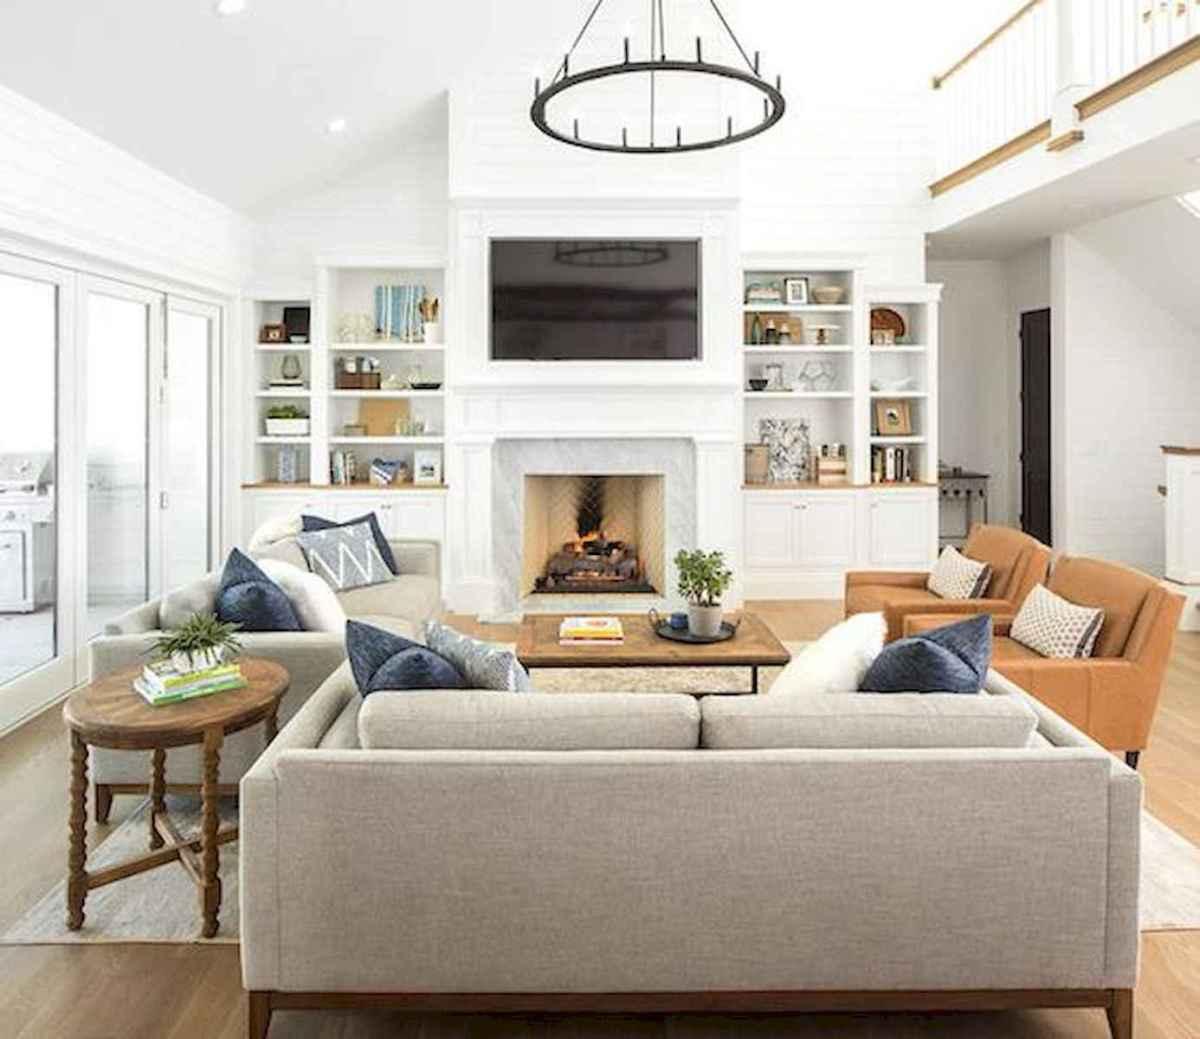 80 Elegant Furniture For Modern Farmhouse Living Room Decor Ideas (23)